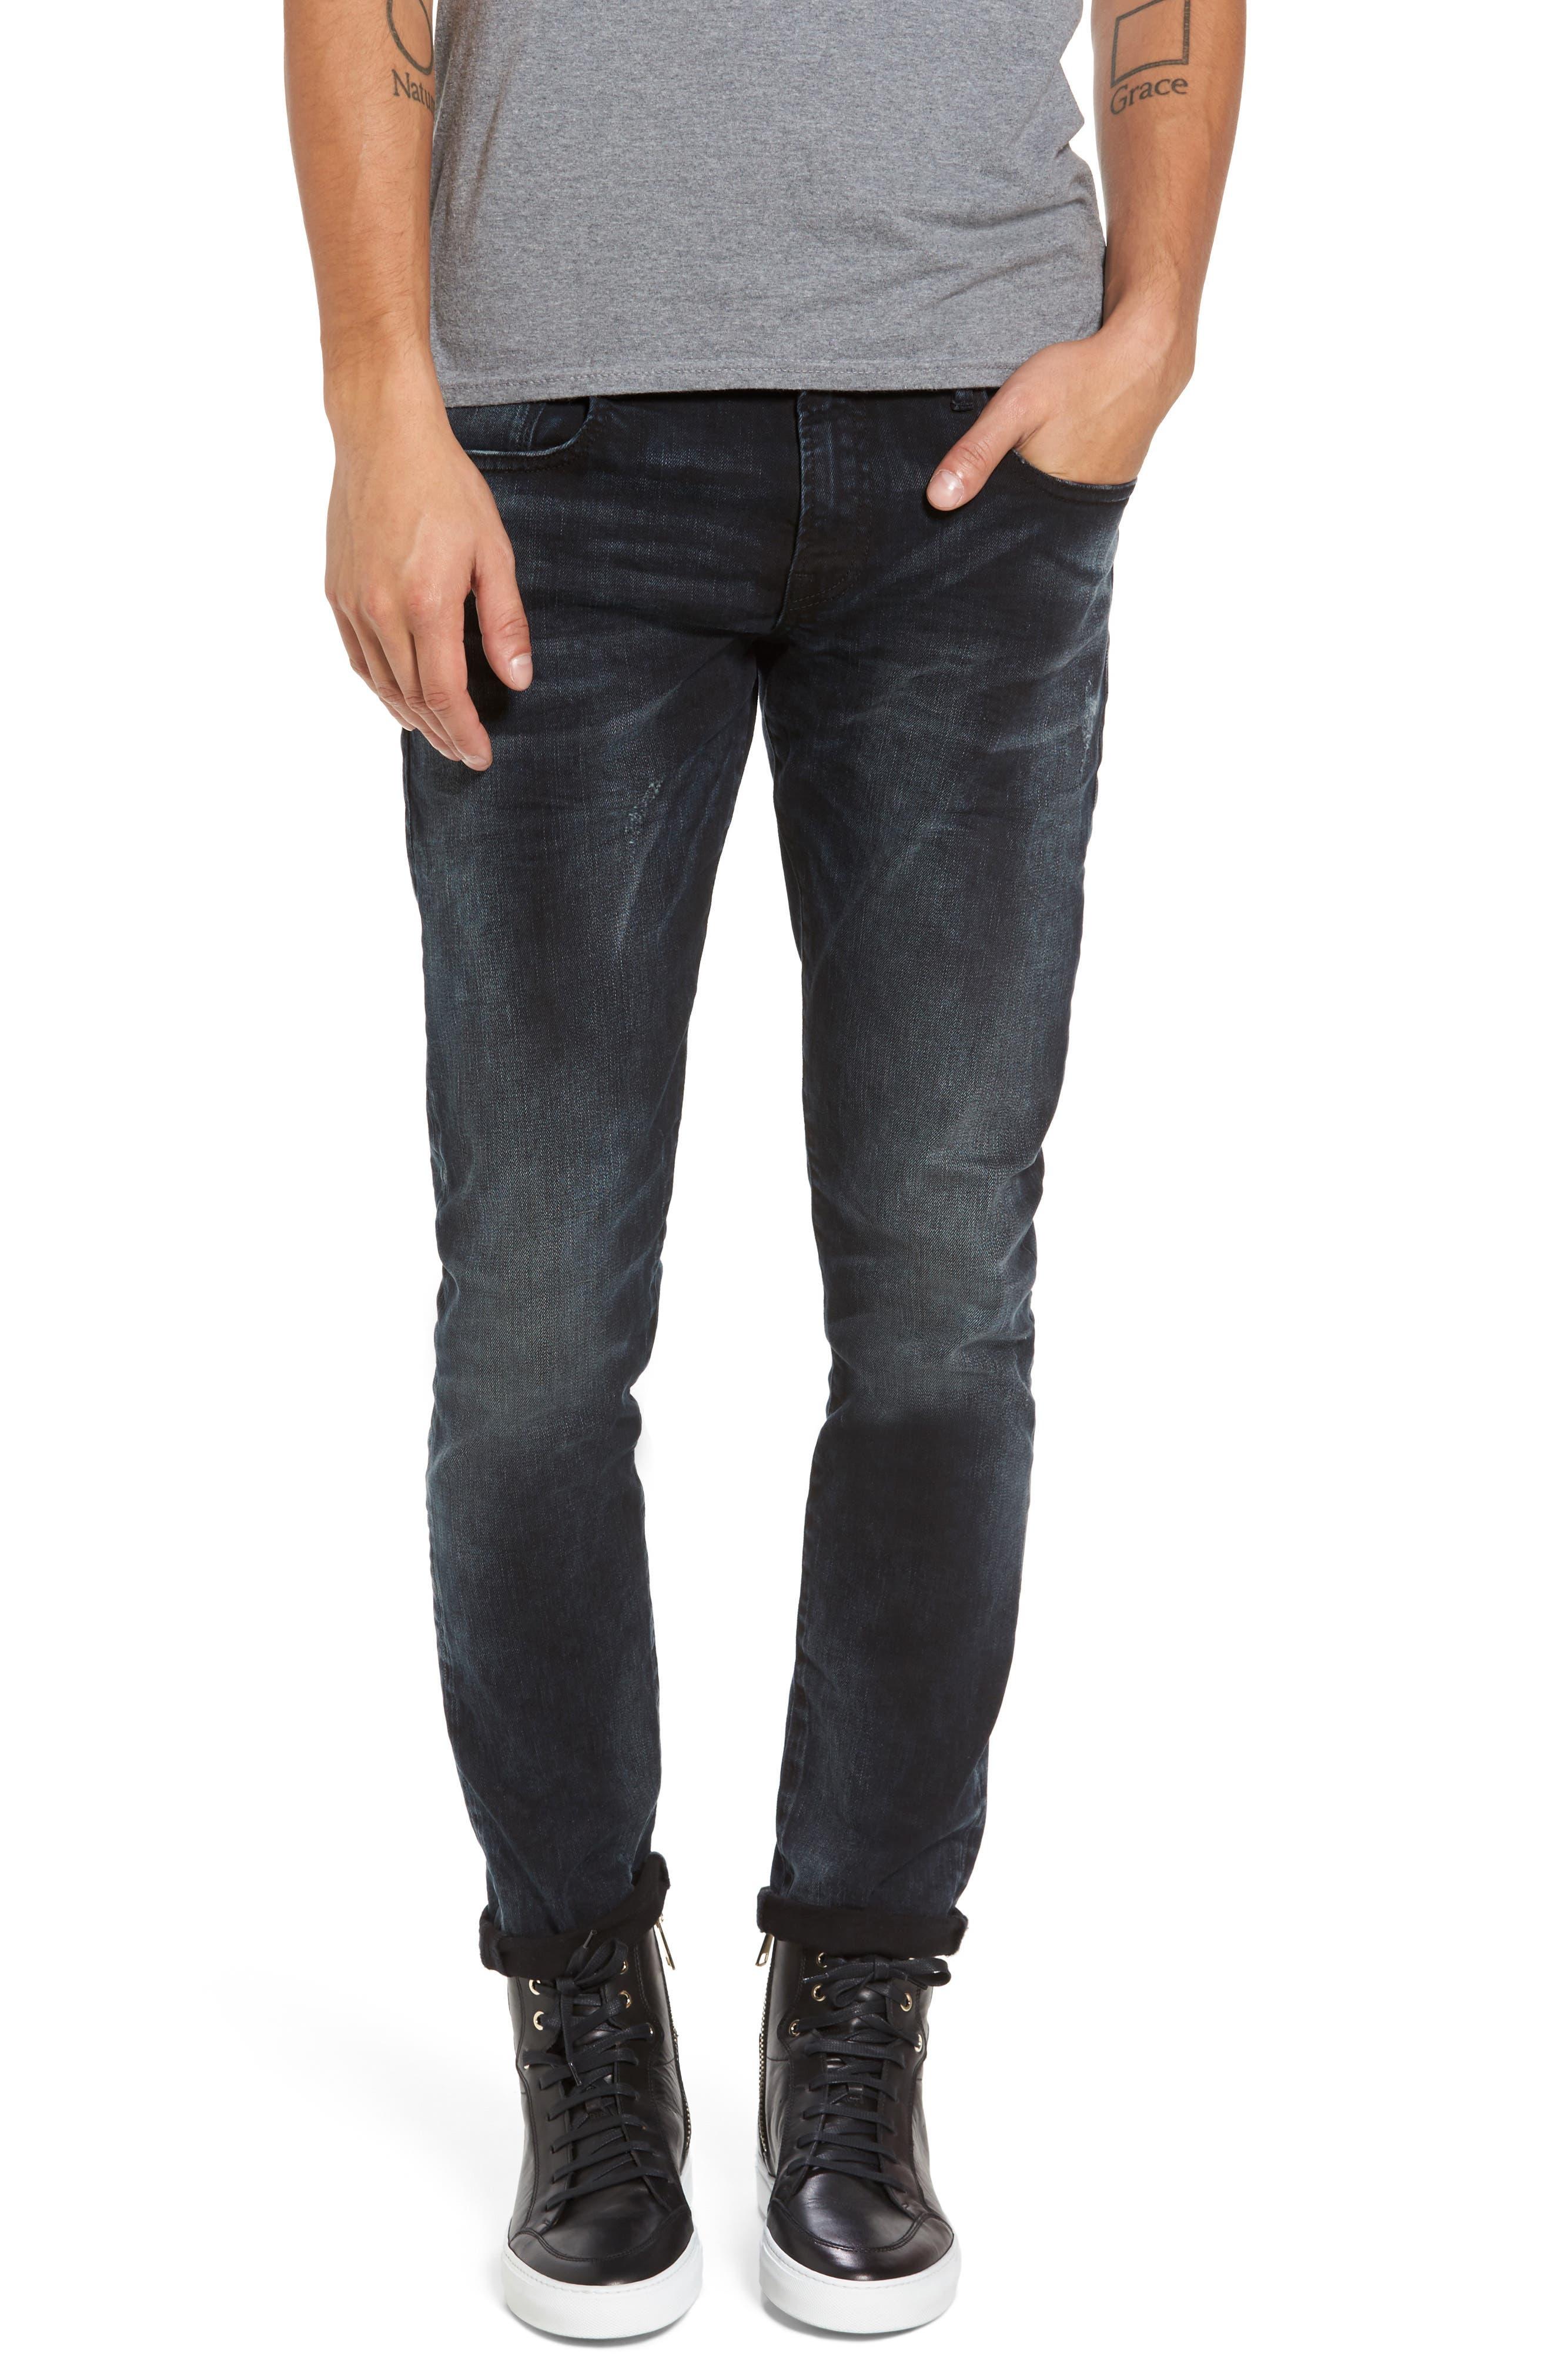 Main Image - Scotch & Soda Tye Slim Fit Jeans (Sander)